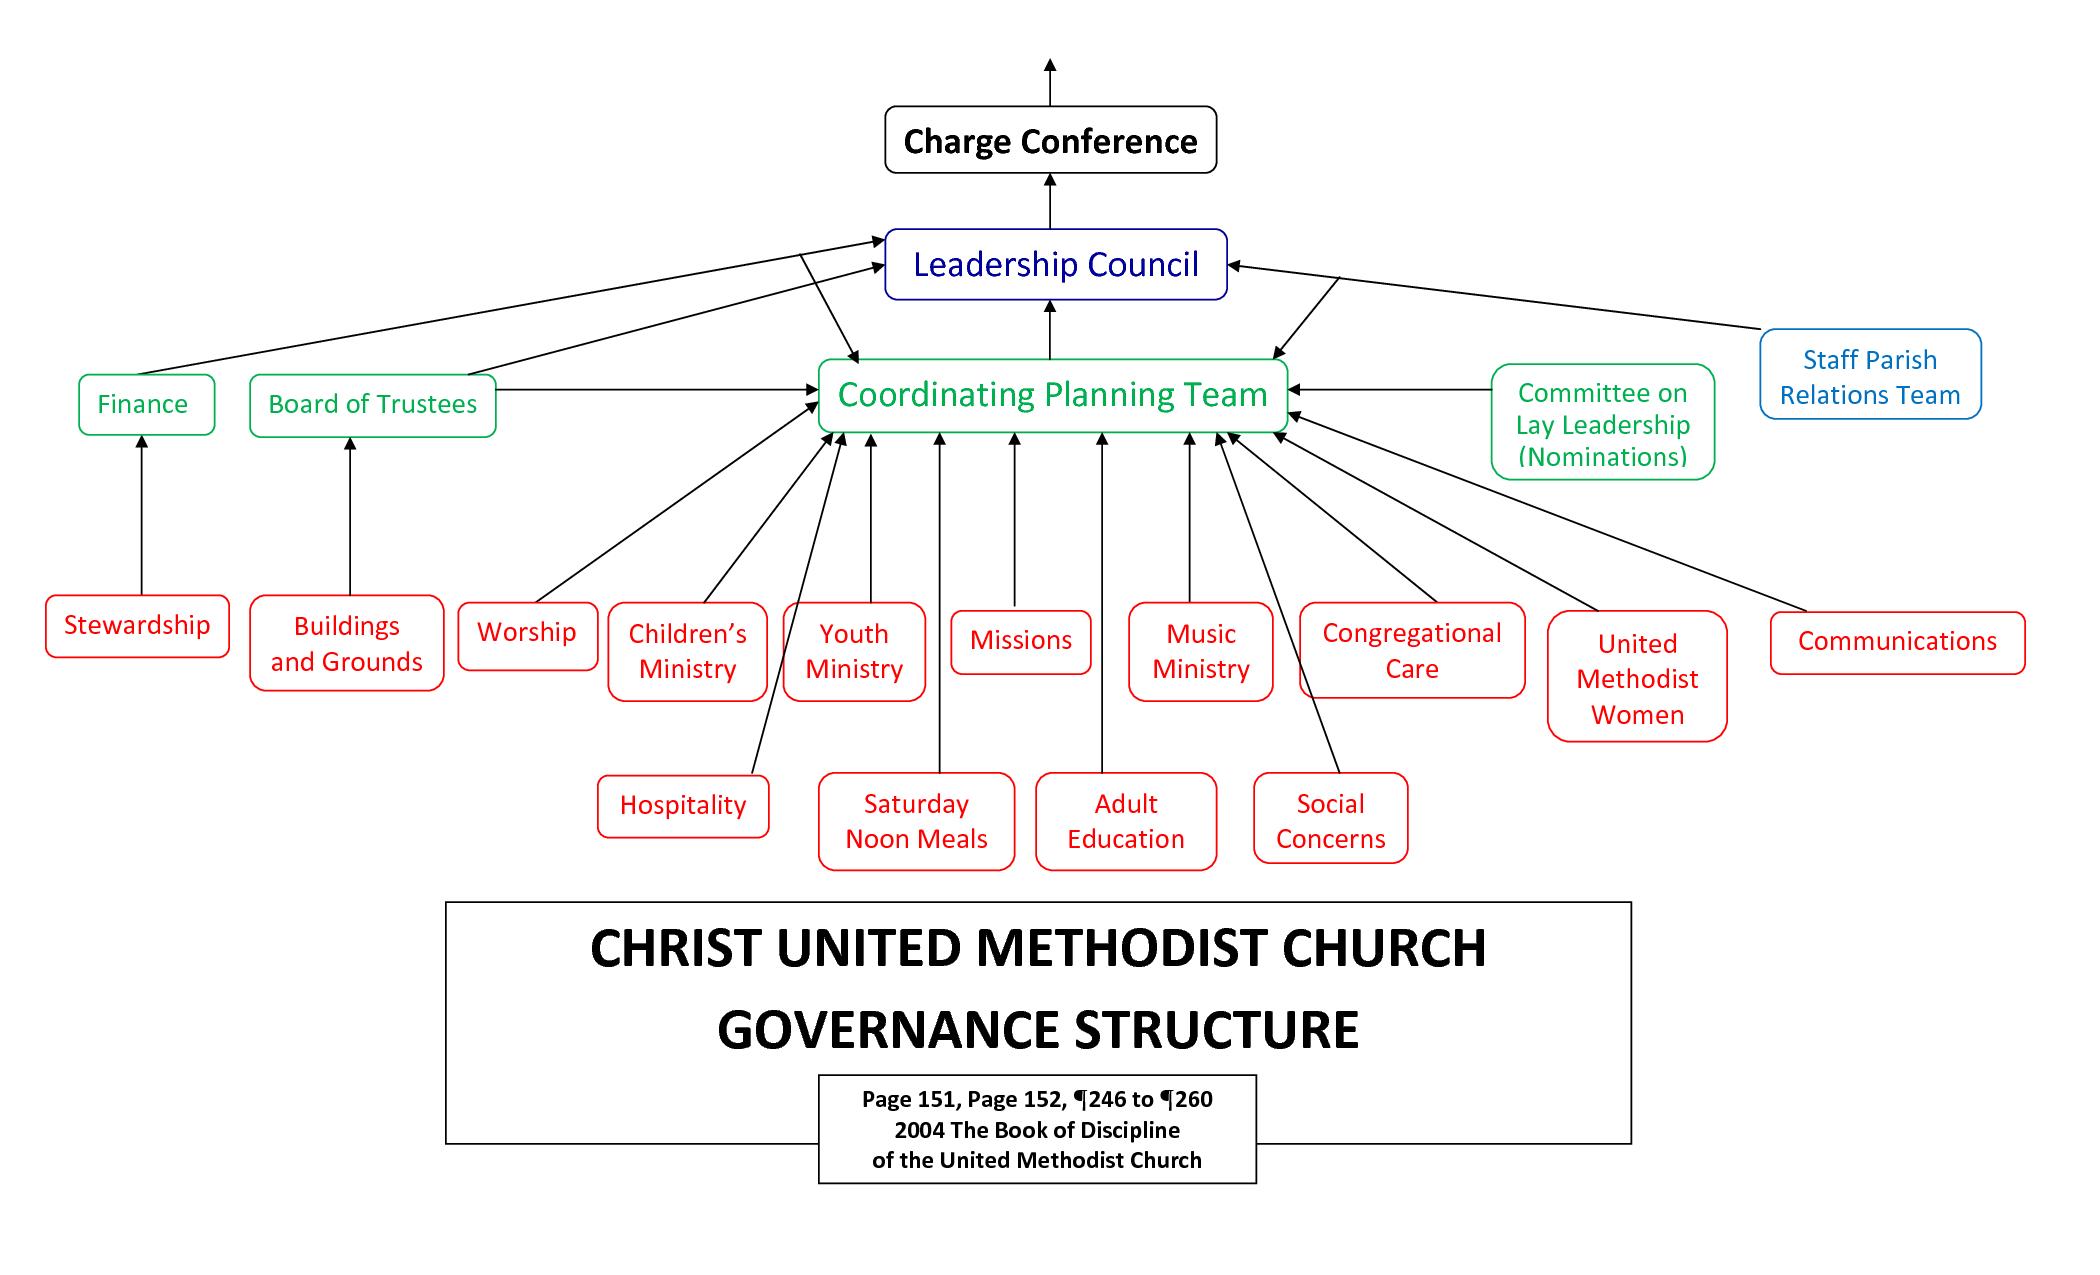 Http Www Cleanri Com Postpic 2014 04 United Methodist Church Leadership Structure 345327 Png Leadership United Methodist United Methodist Church